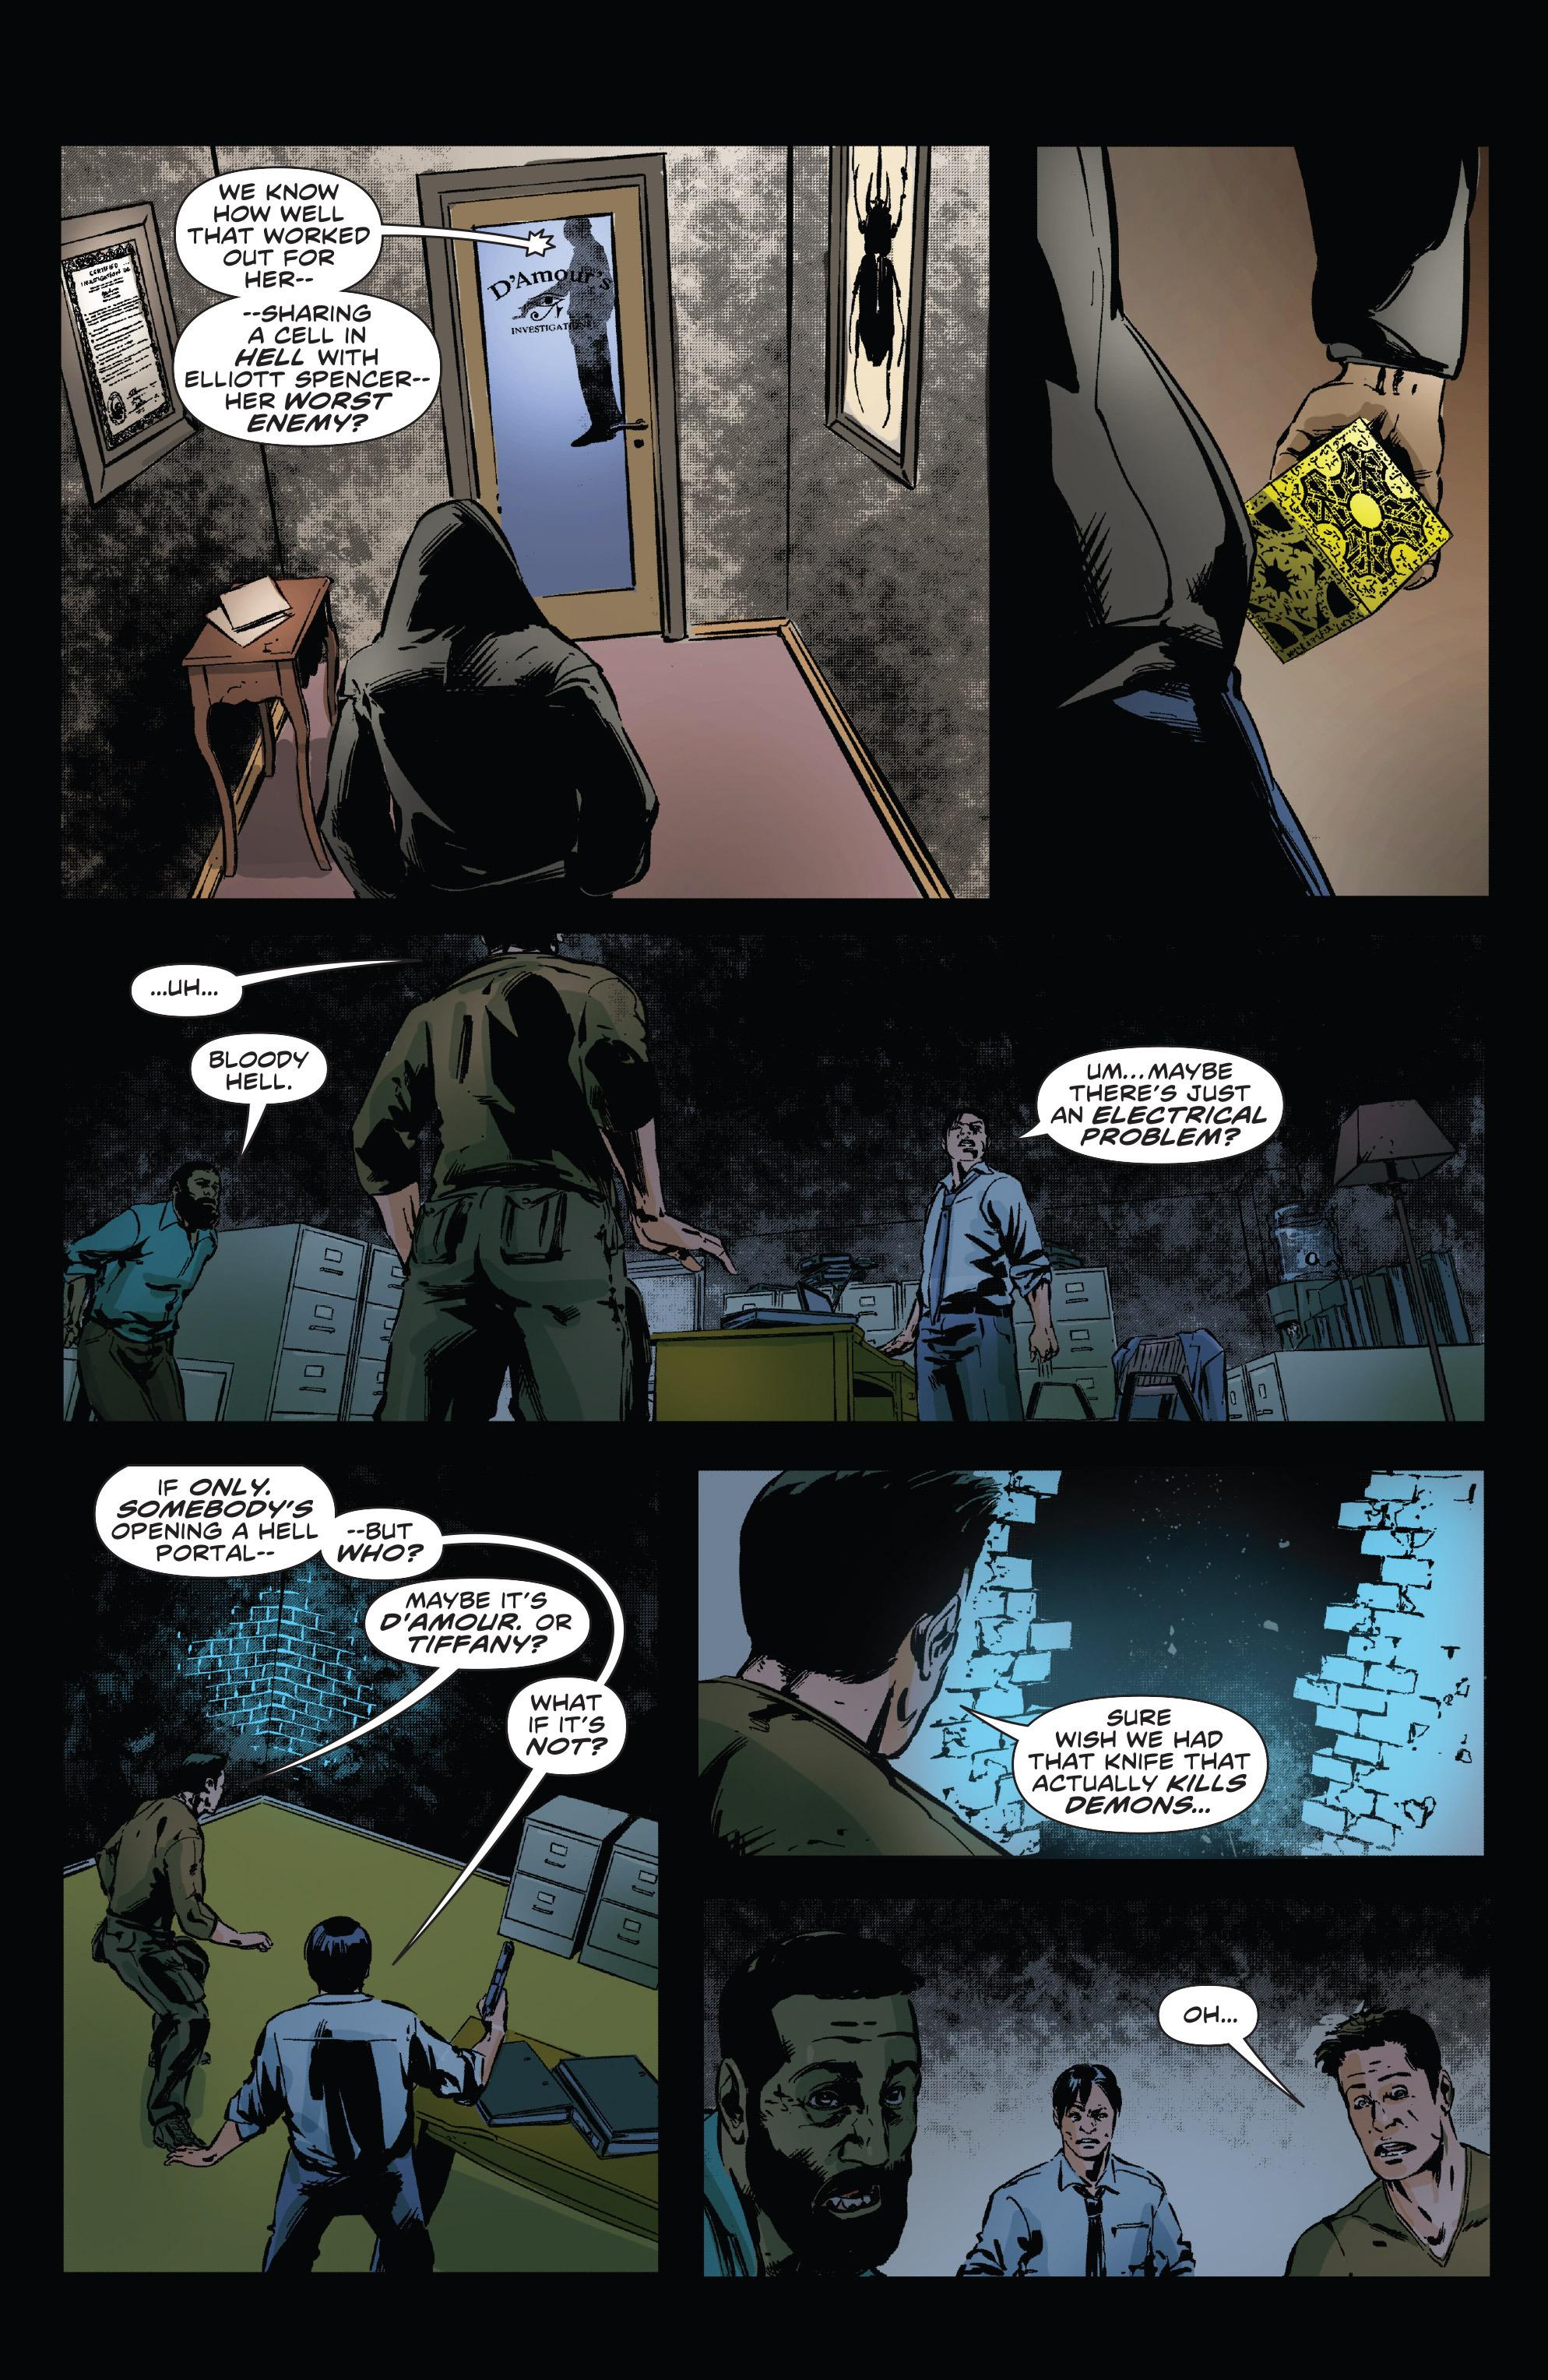 Read online Clive Barker's Hellraiser: The Dark Watch comic -  Issue # TPB 3 - 40